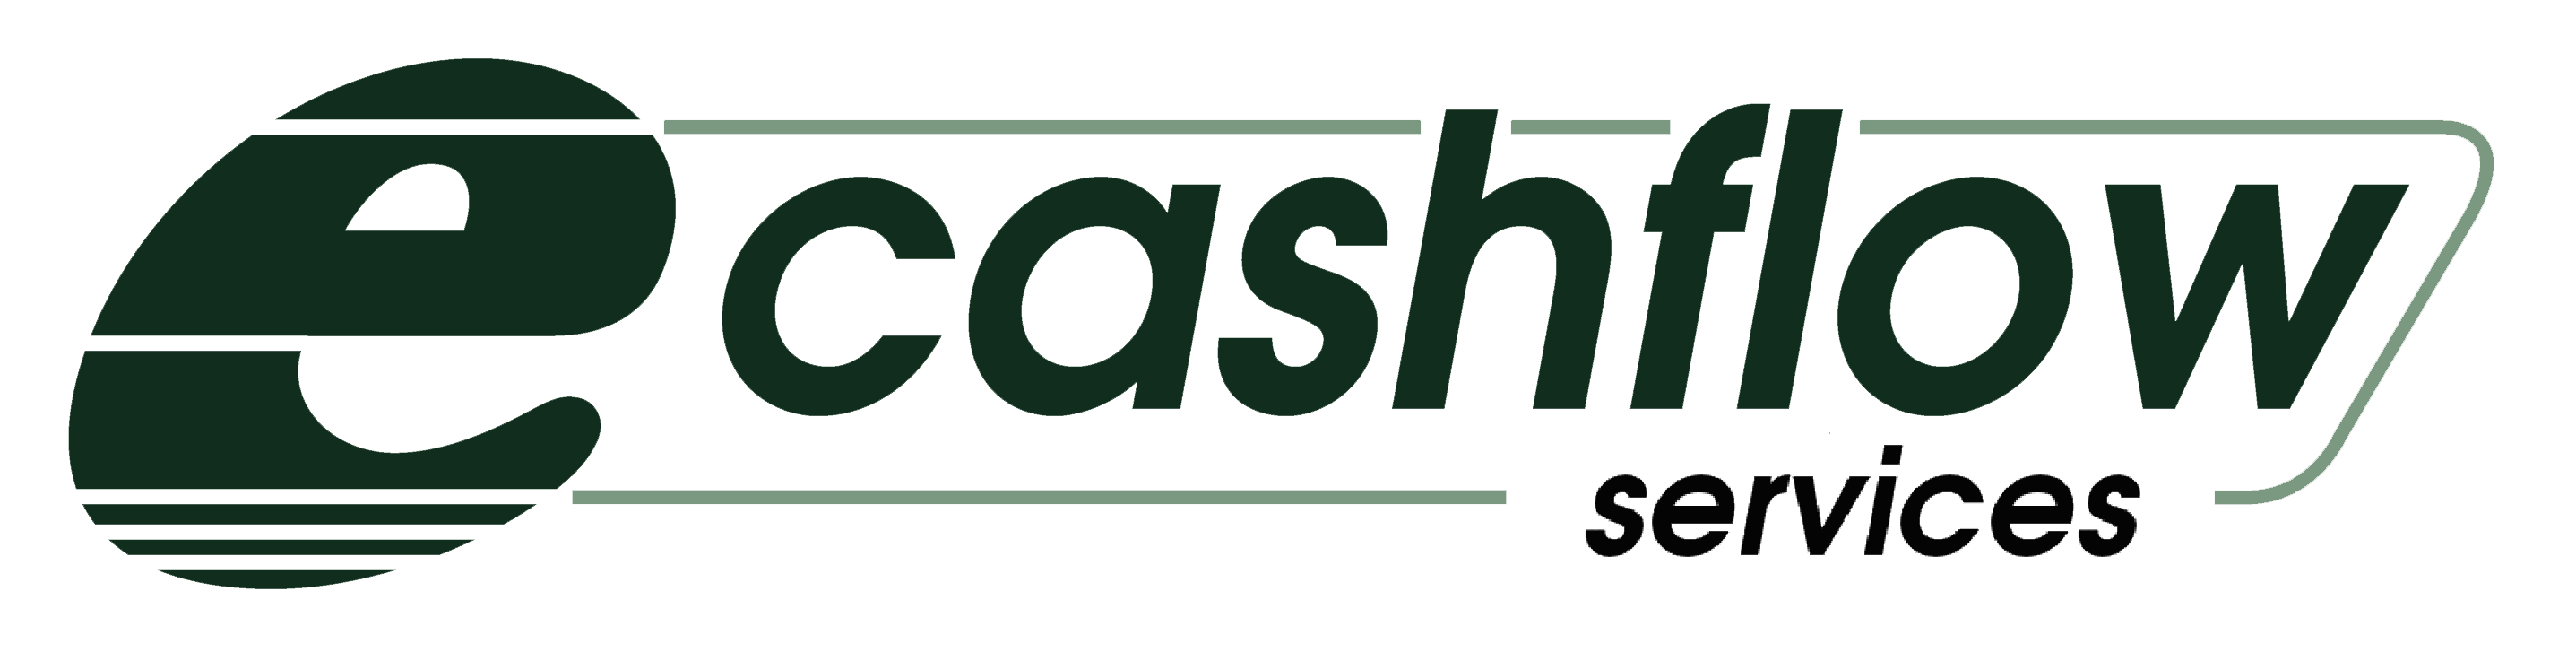 Request an eCashflow Demo!